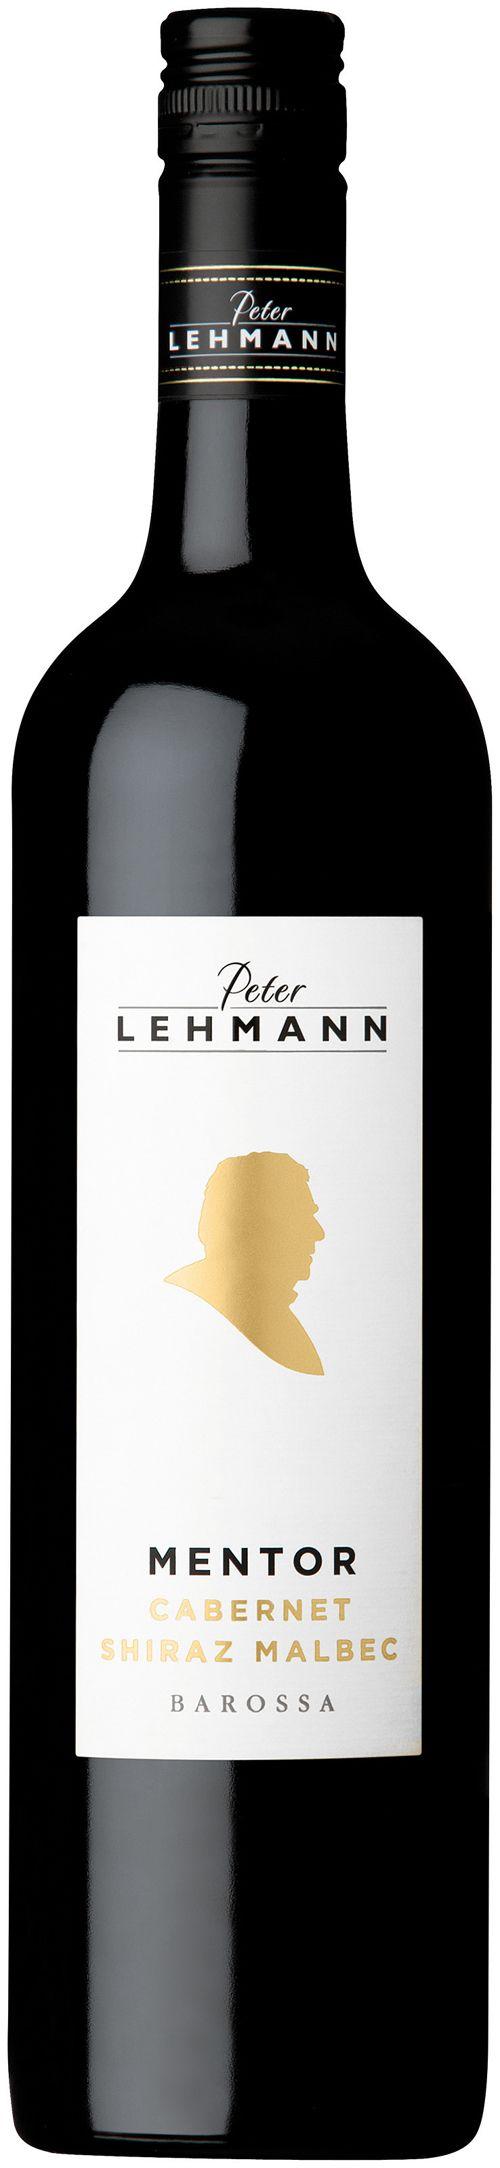 "Peter Lehman ""The Mentor"" a wine as legendary as it's maker."